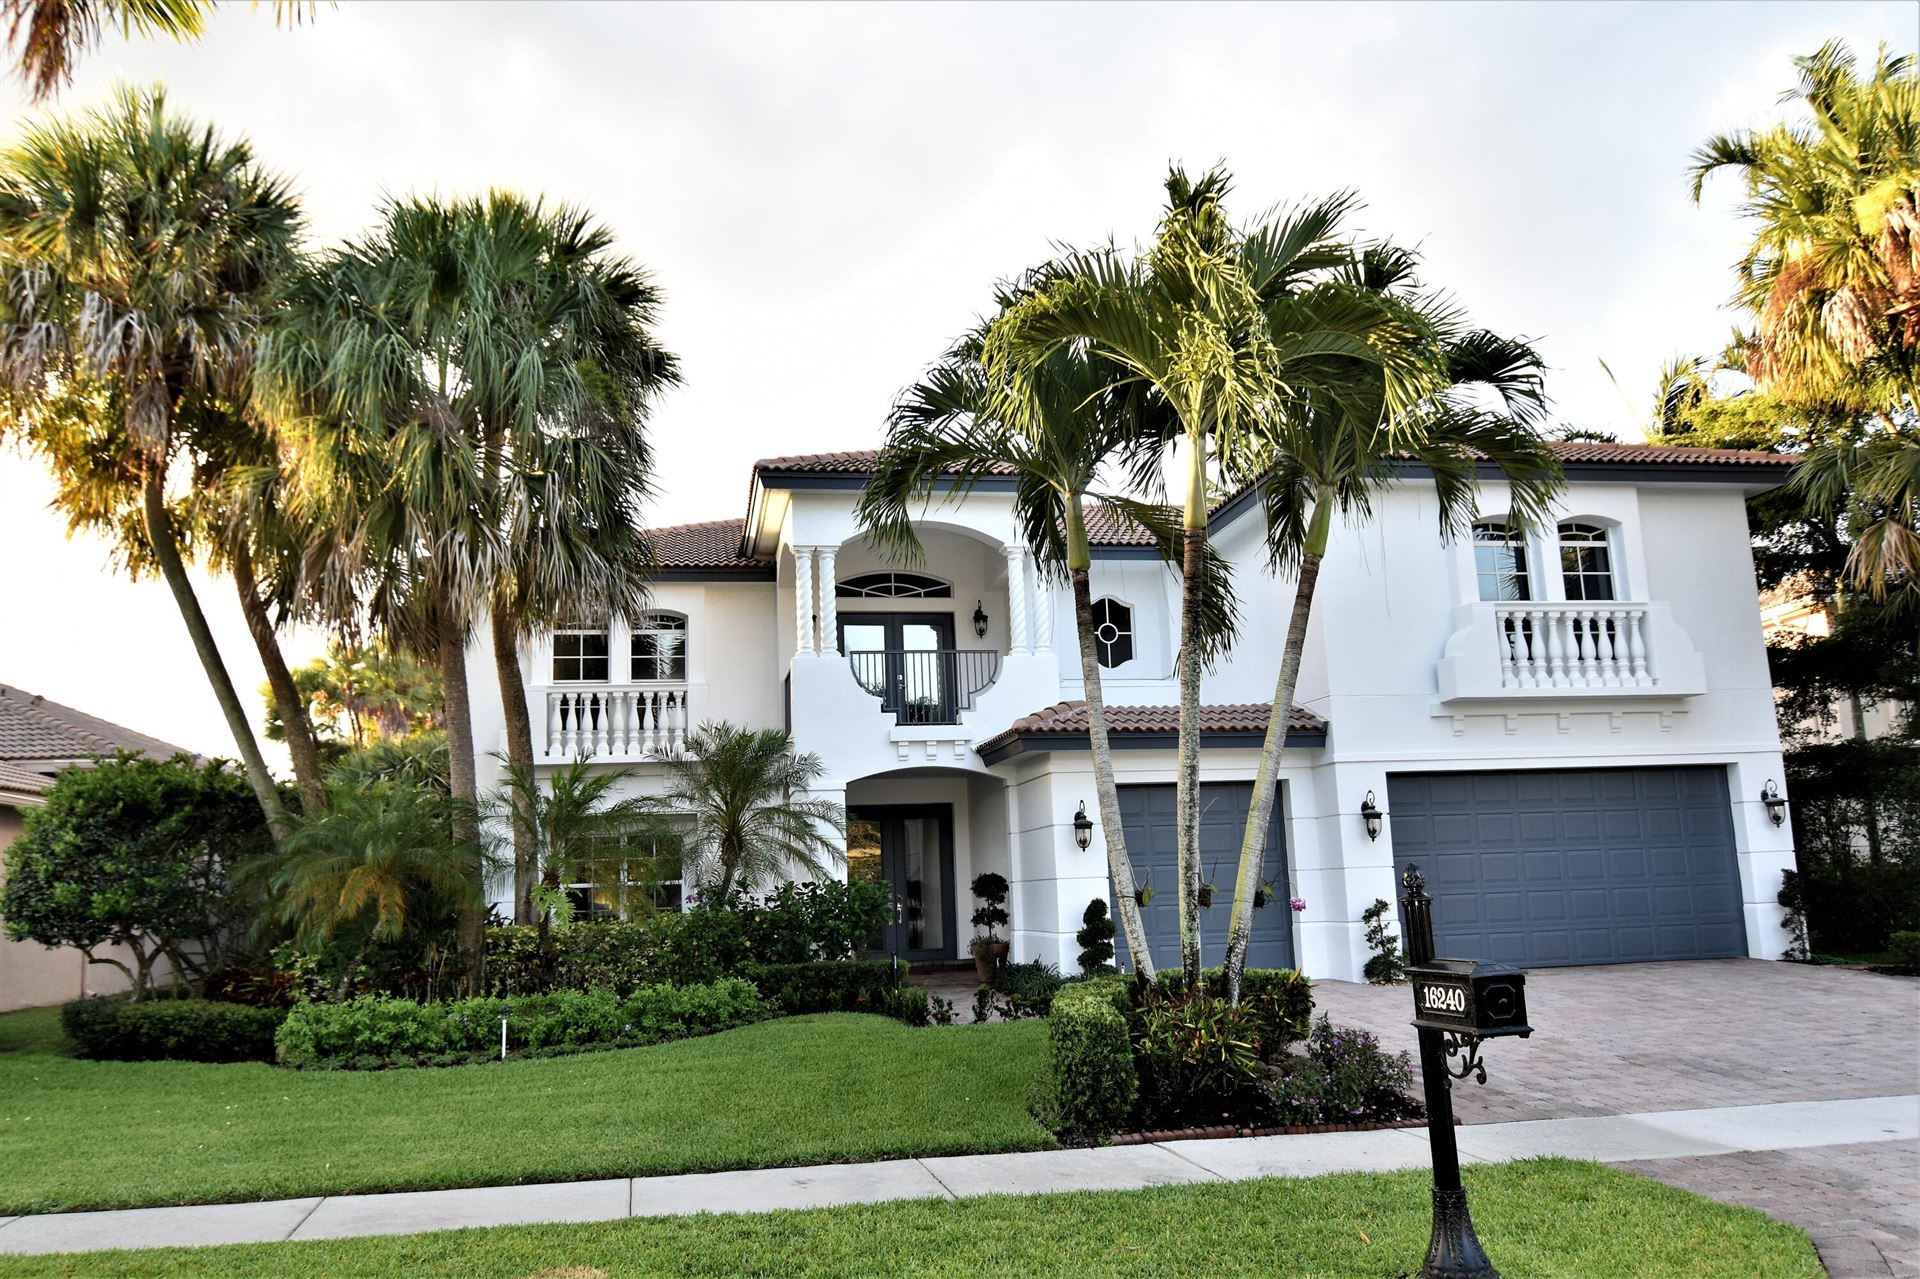 16240 Mira Vista Lane, Delray Beach, FL 33446 - MLS#: RX-10723469